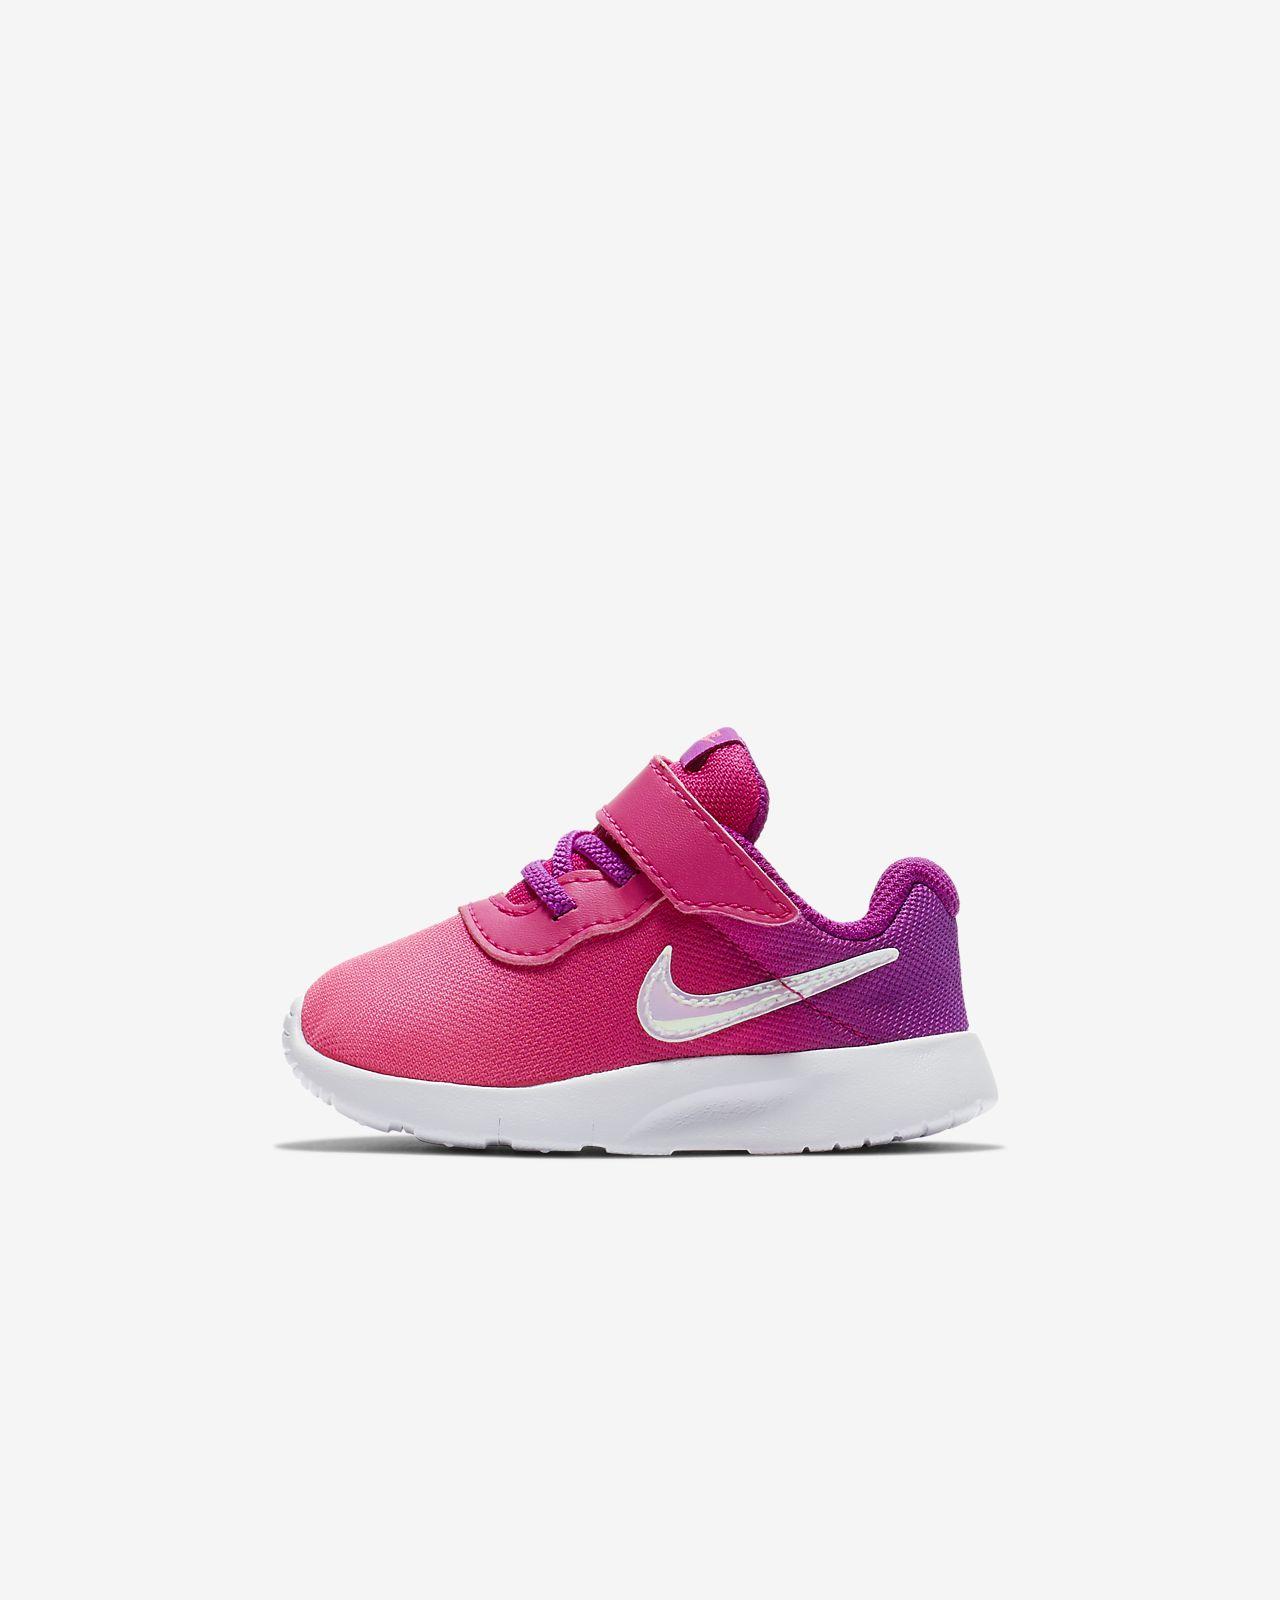 afc8dae9ac9288 Nike Tanjun Print Infant Toddler Shoe. Nike.com